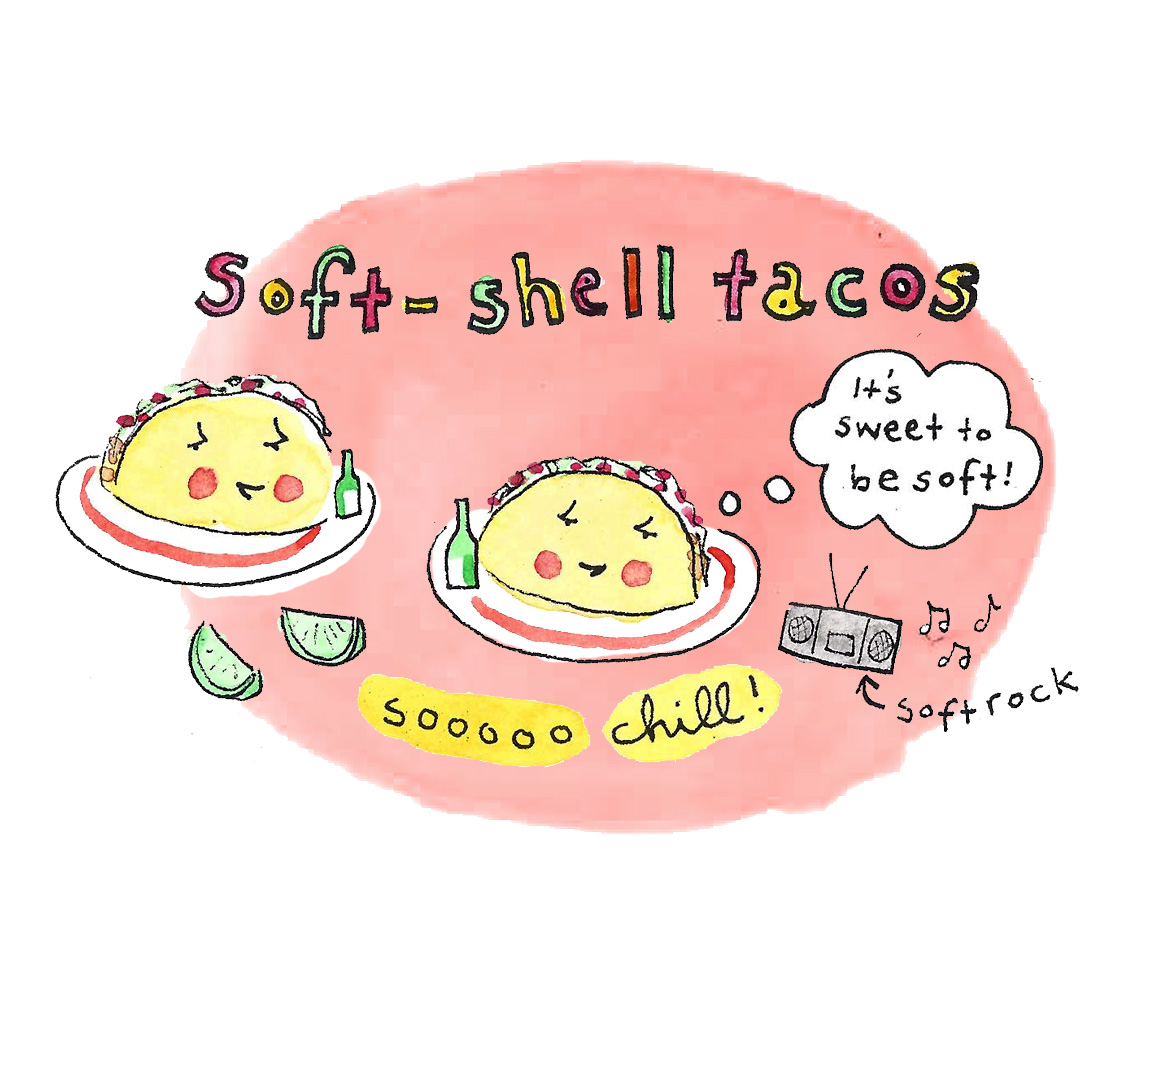 Soft-shell tacos